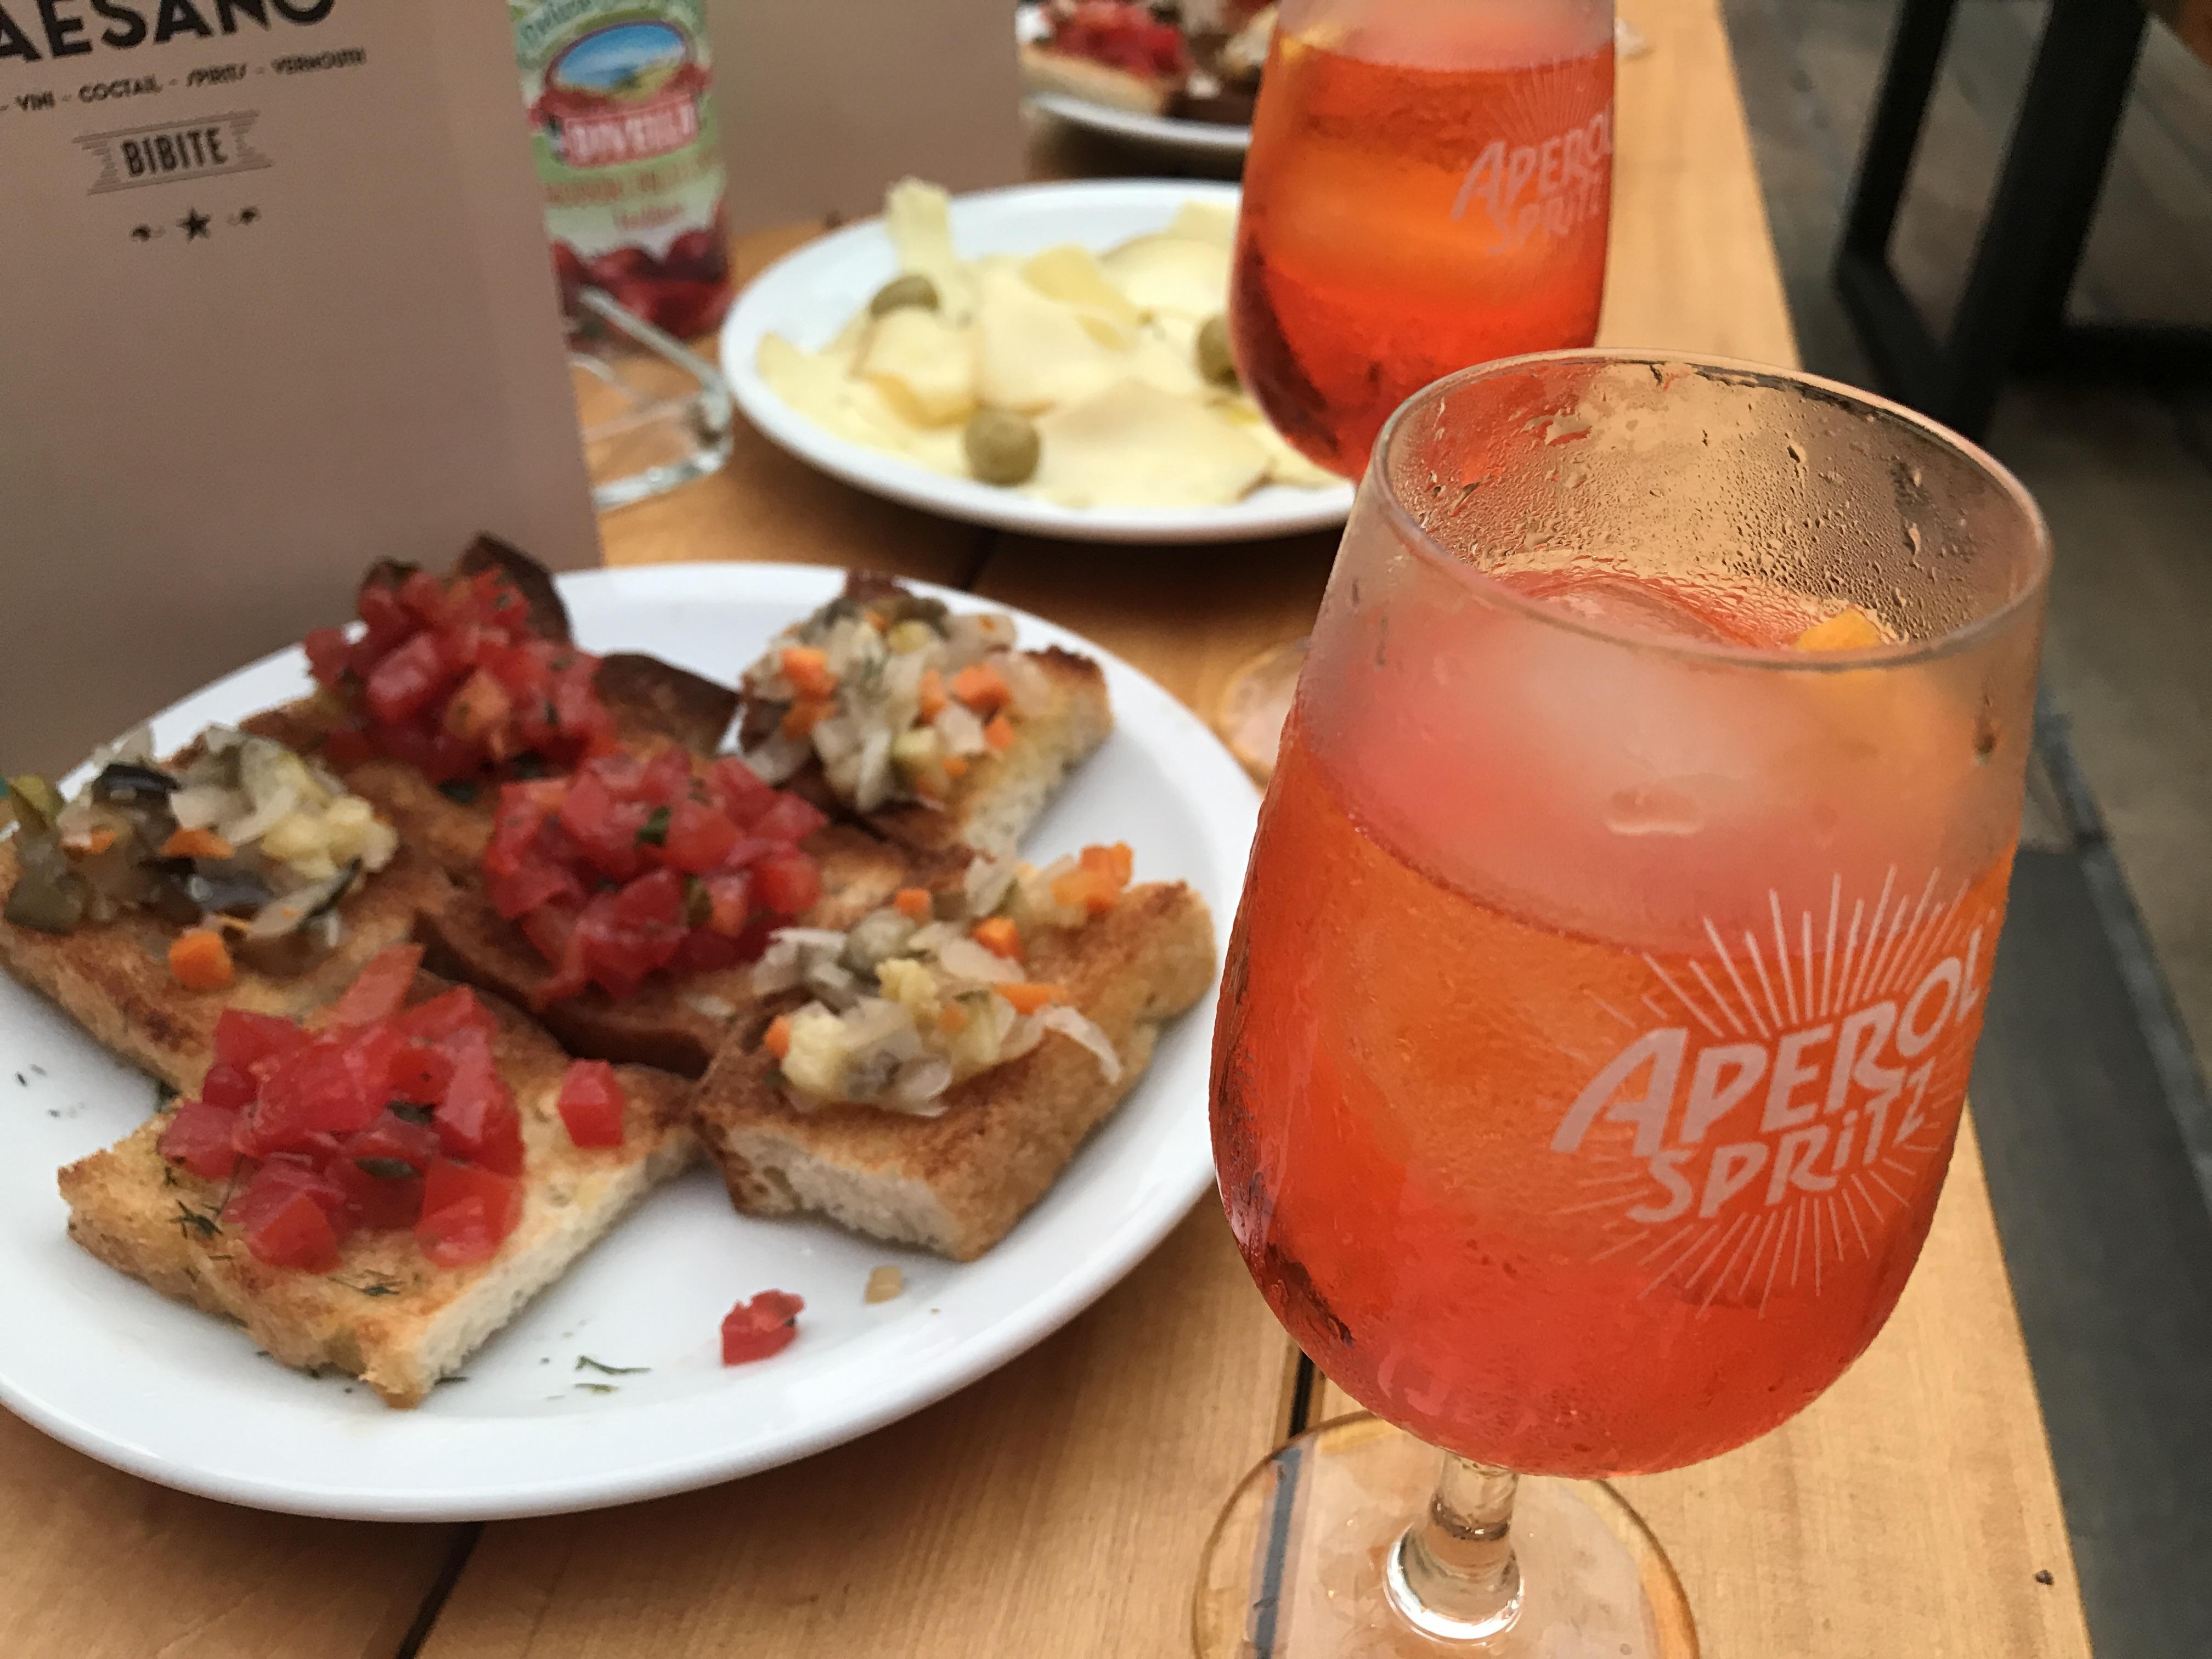 Paesano Rosso, nuevo restaurante italiano en La Plata